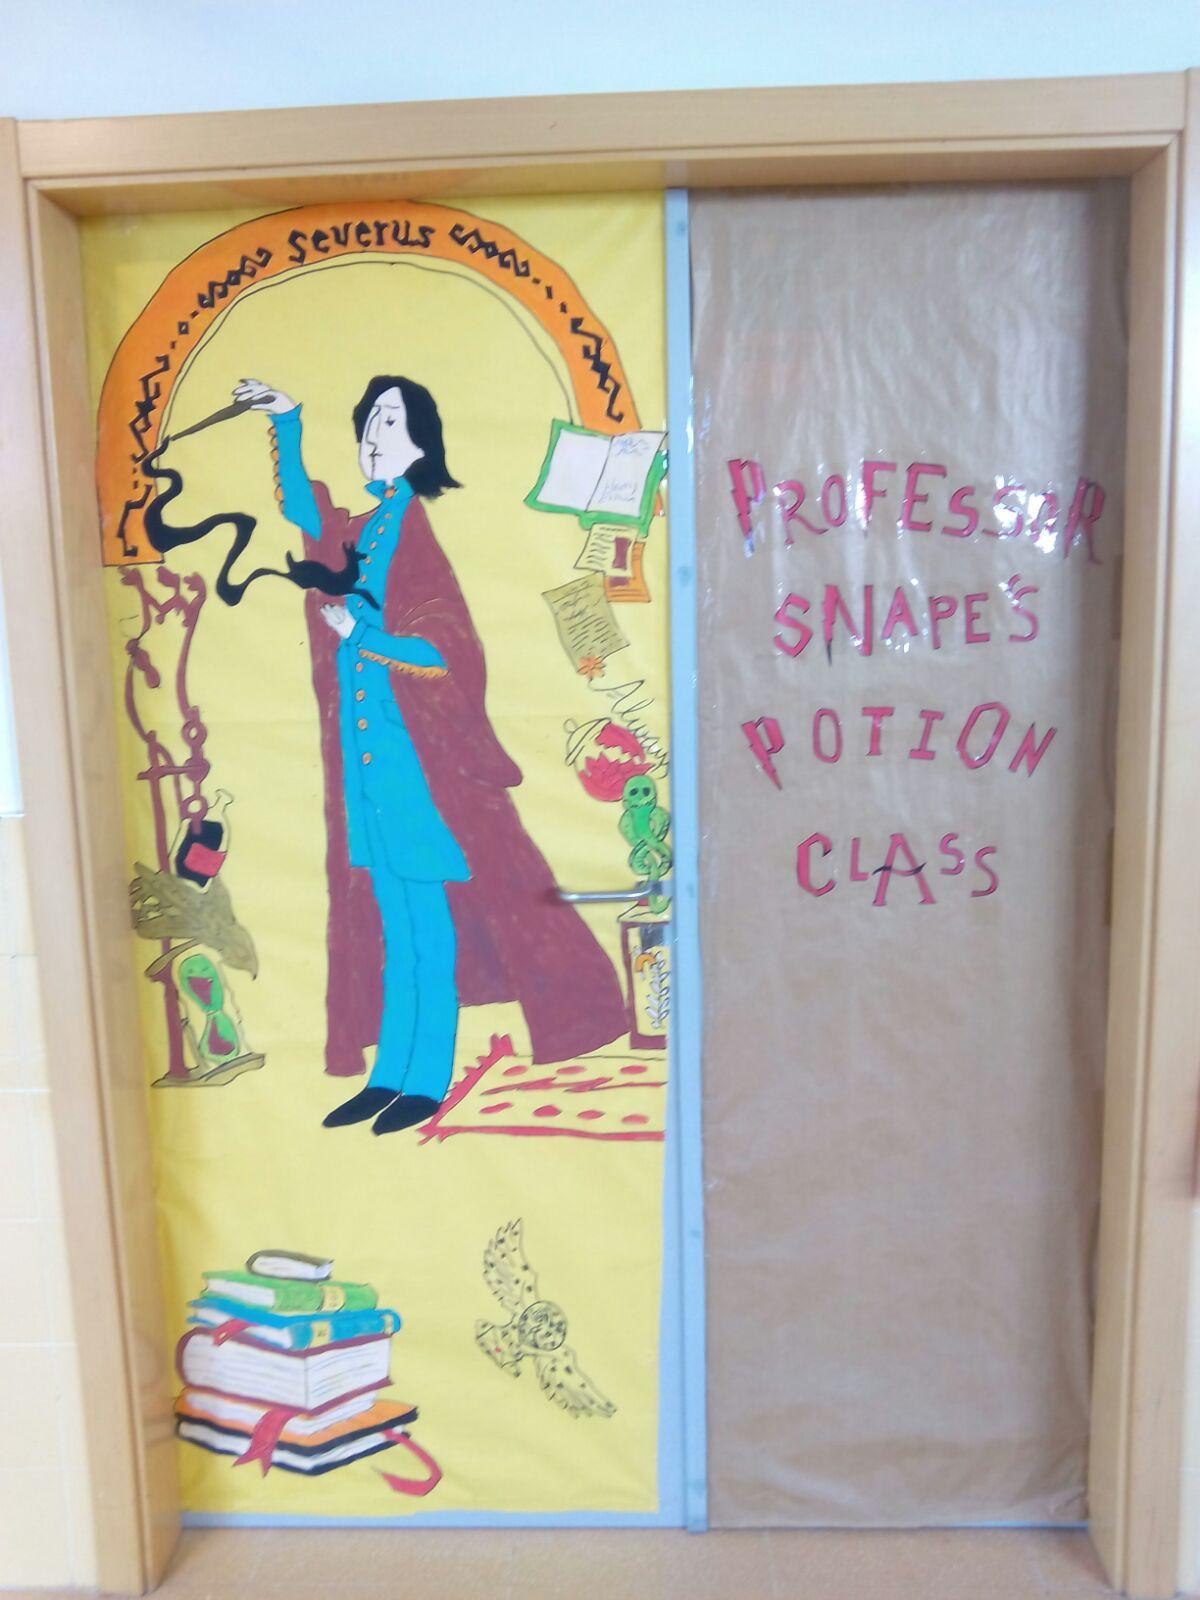 PROFESSOR SNAPE´S POTION CLASS